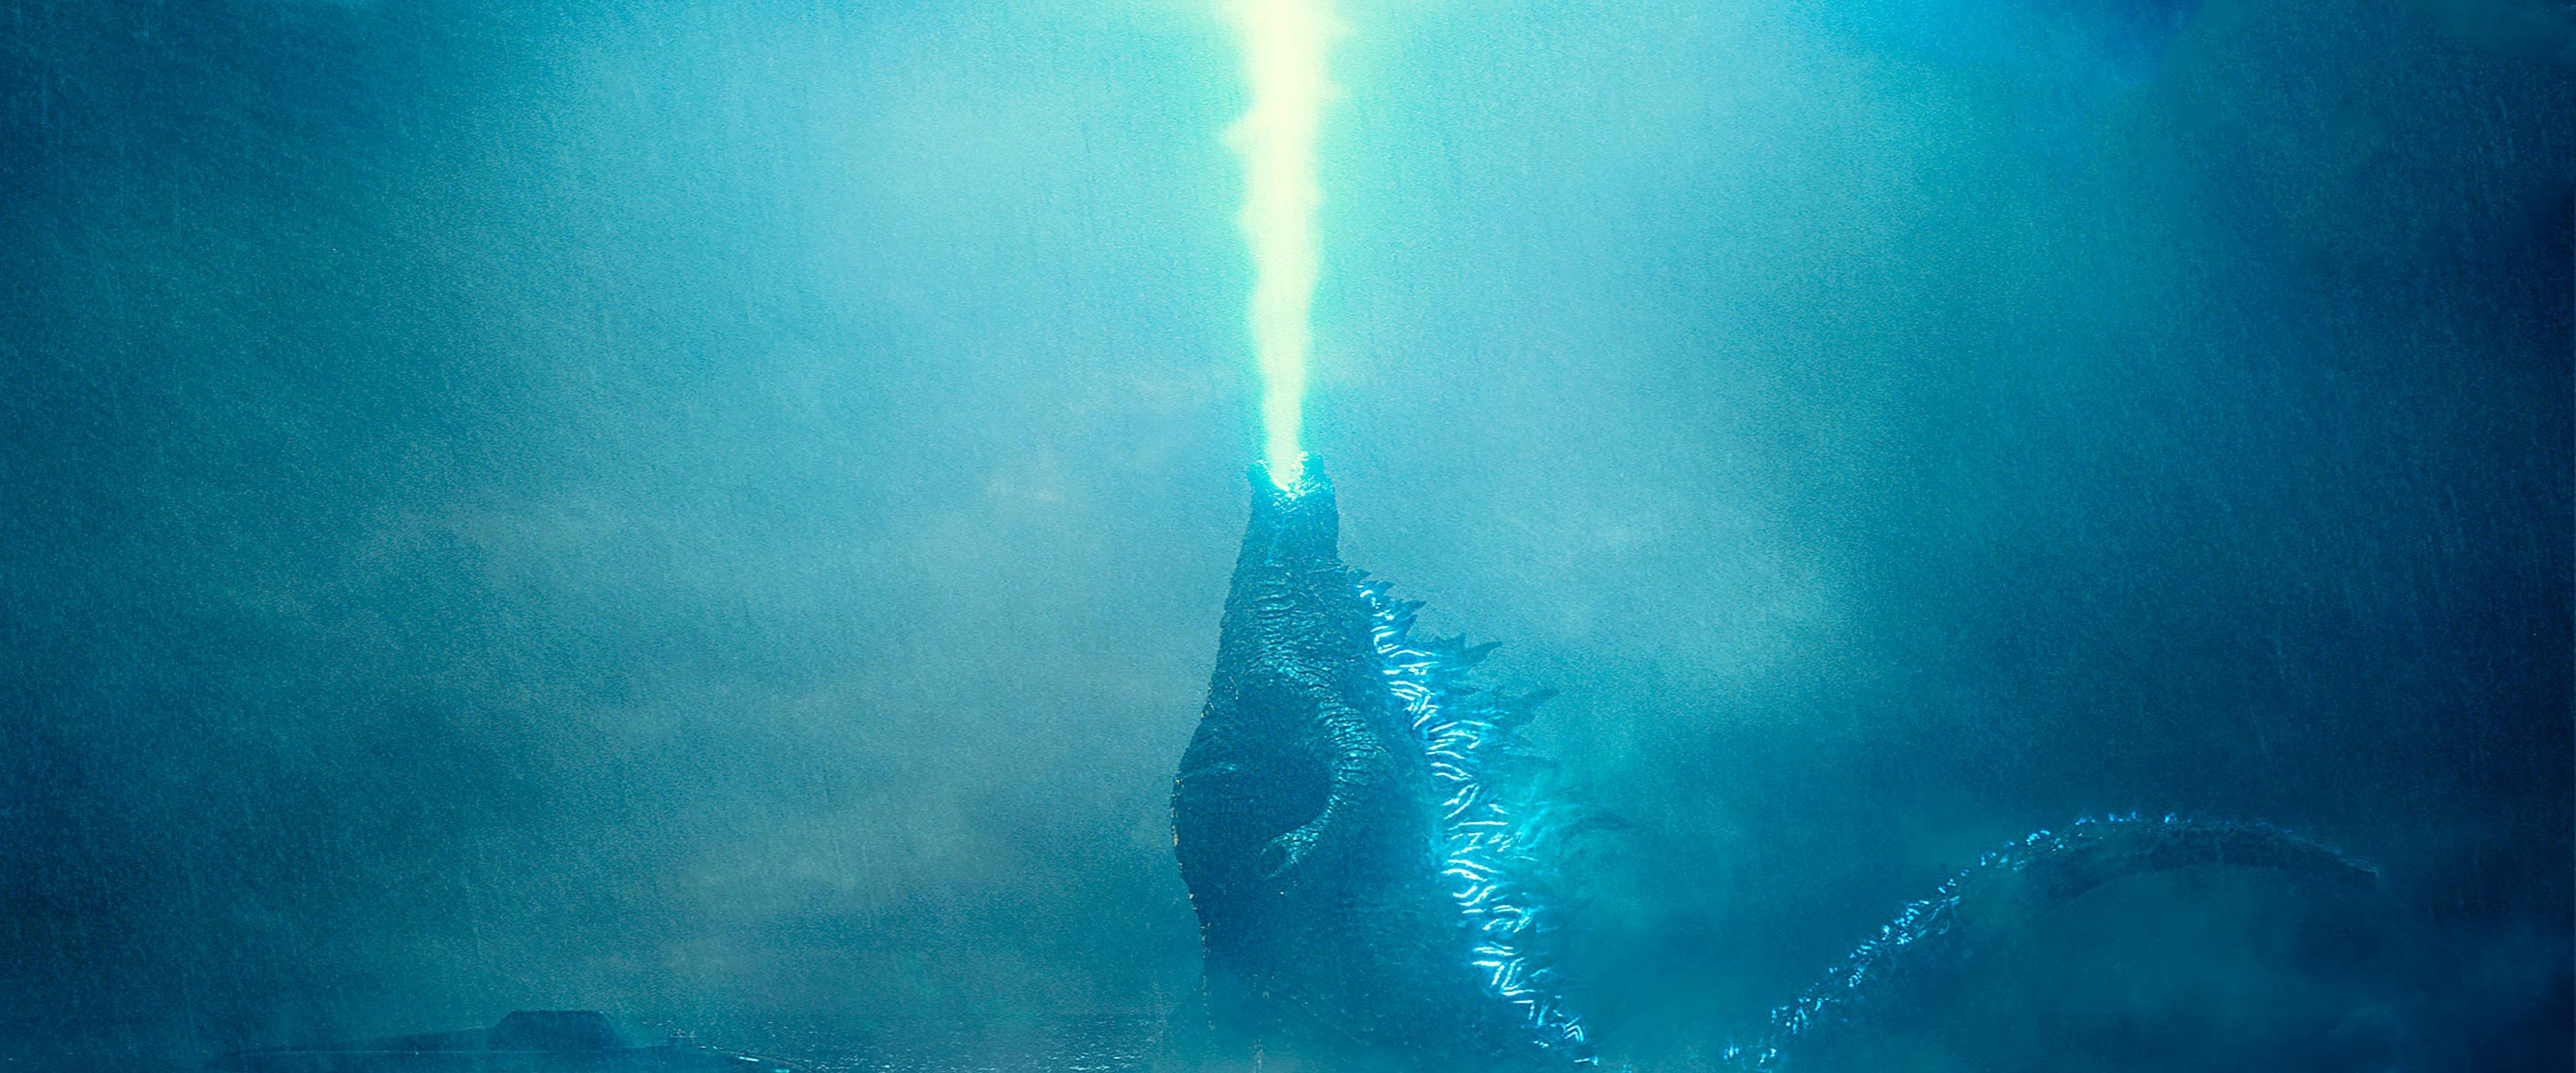 Godzilla King Of The Monsters 4k Wallpaper 8